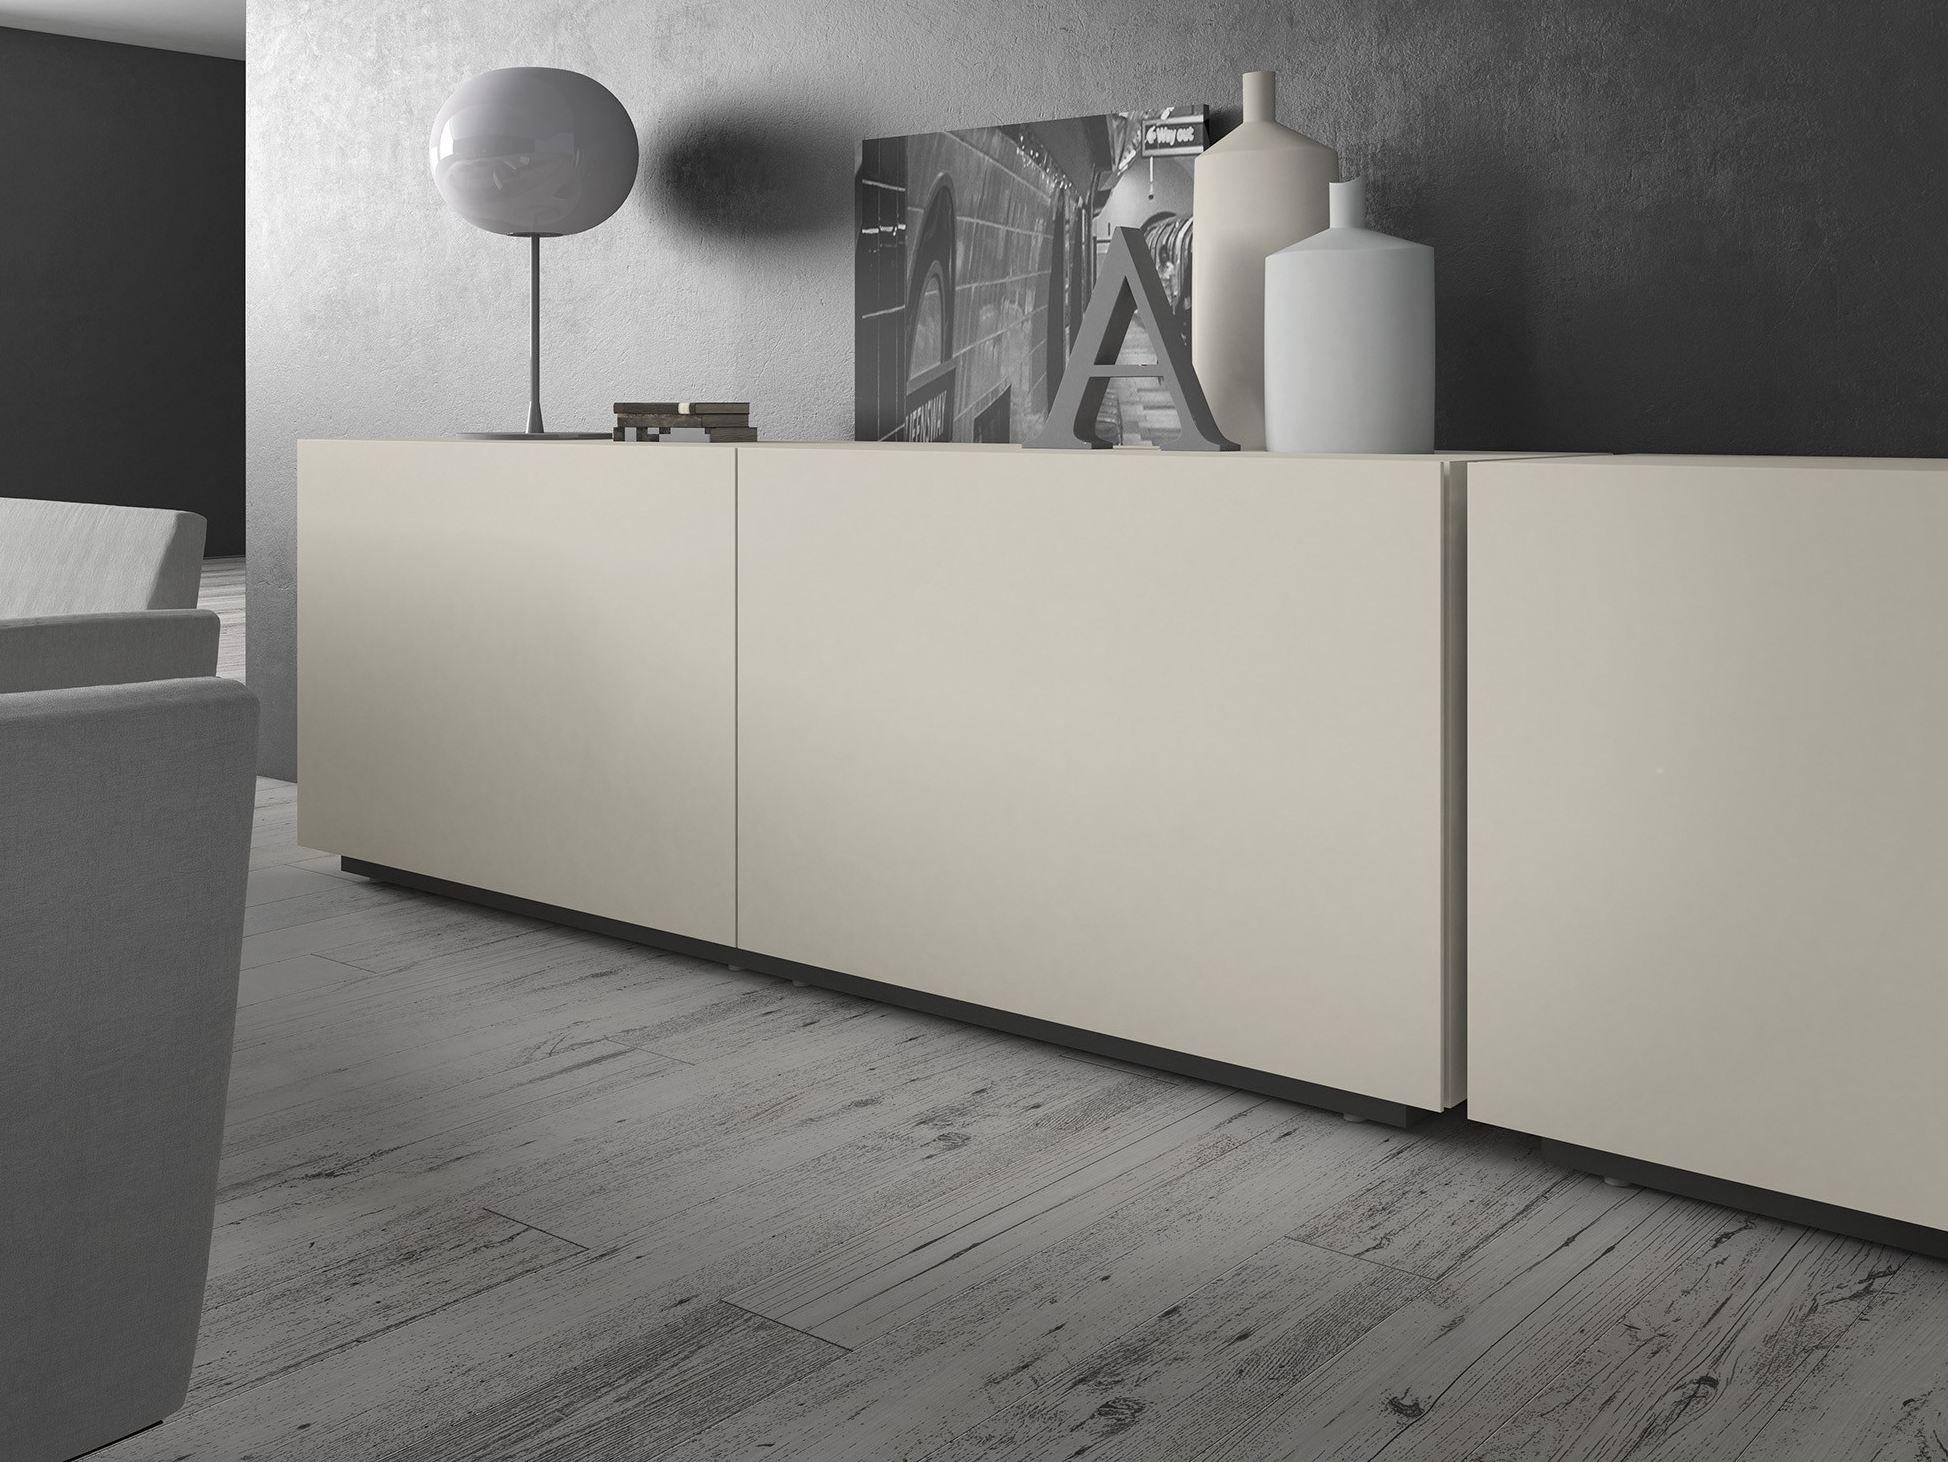 Buffet laqu e en bois portes coulissantes rewind by for Presotto industrie mobili